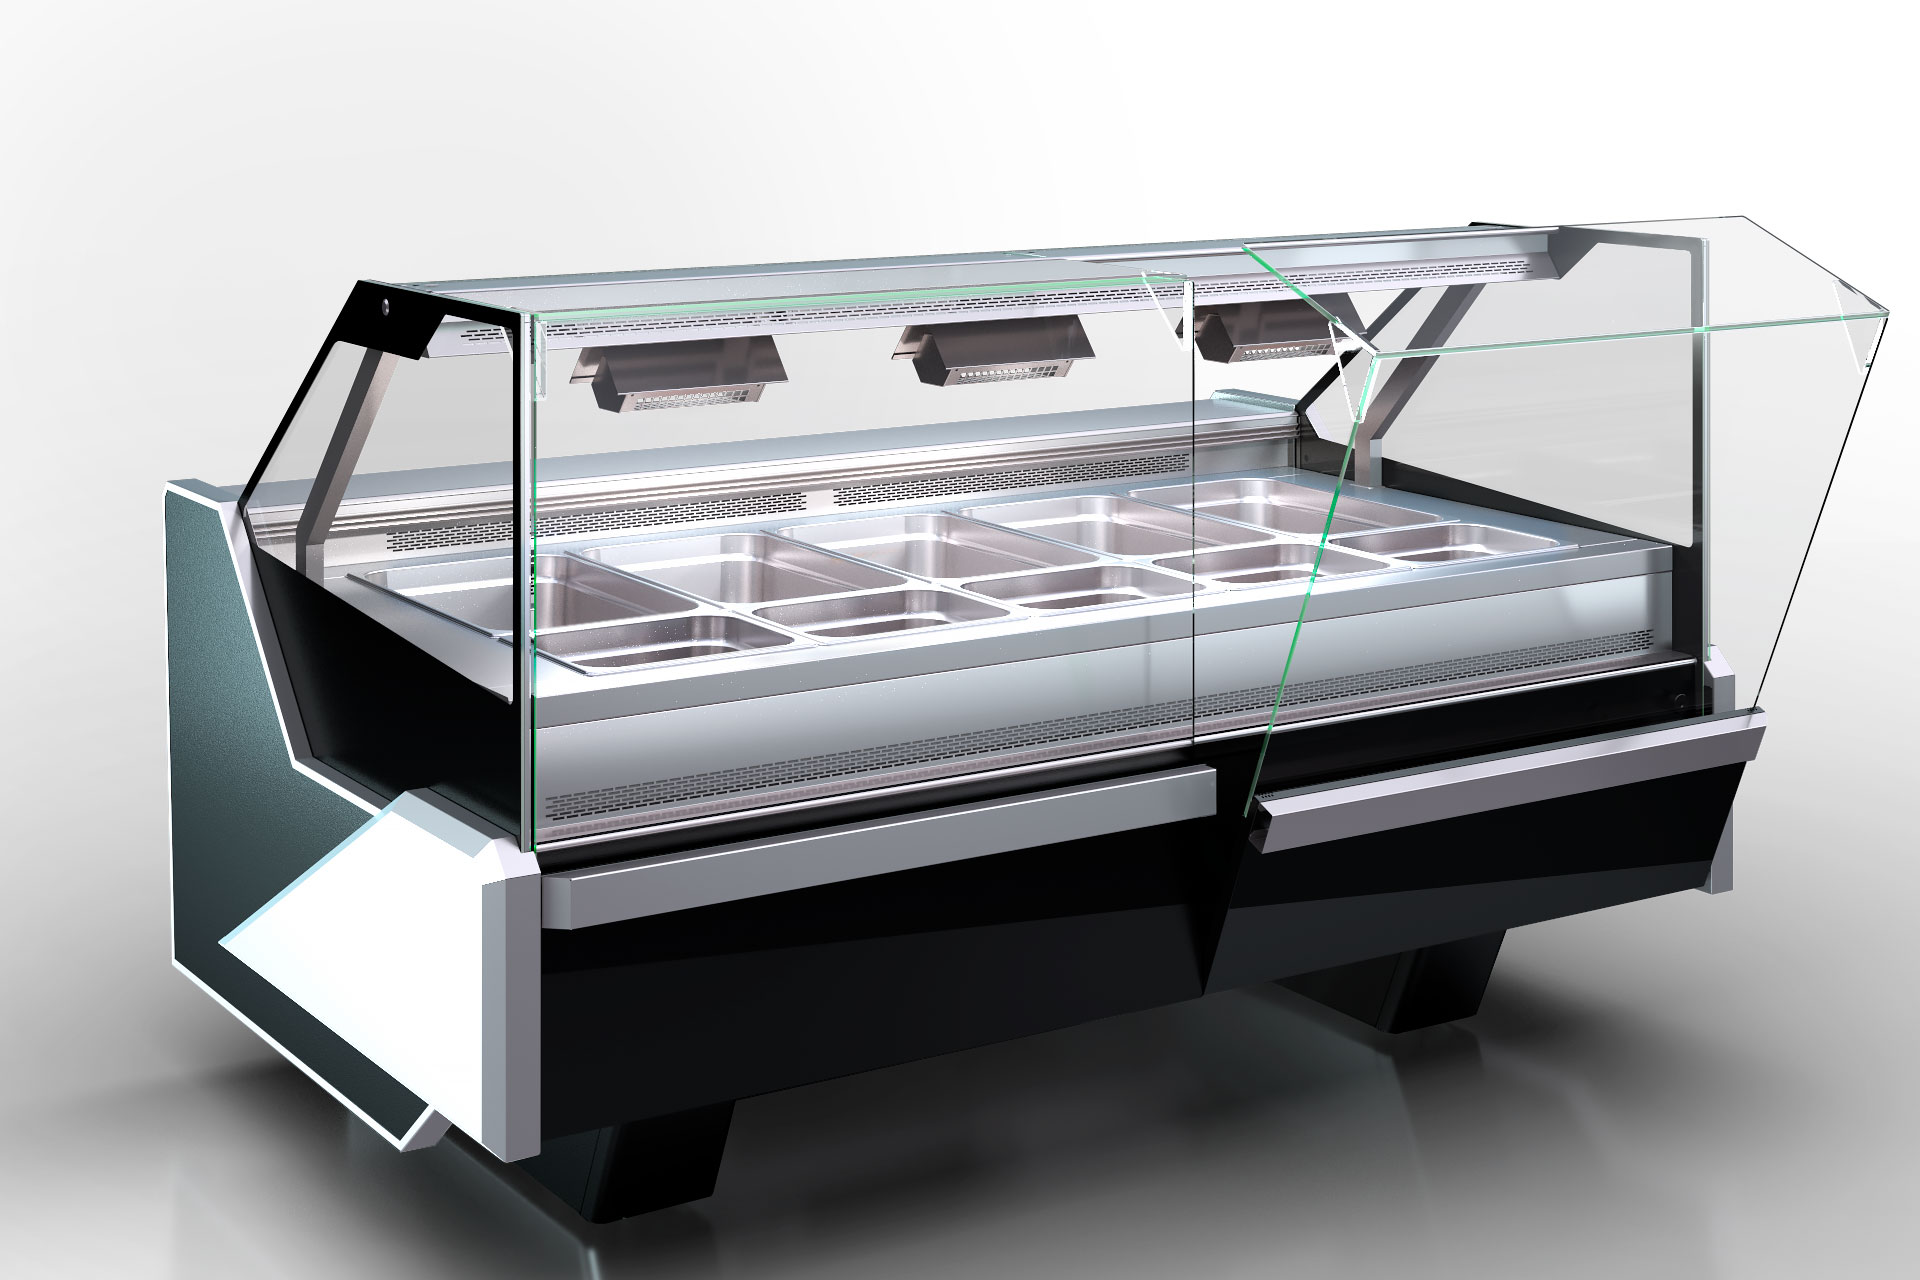 Холодильная витрина Missouri enigma NC 125 heat BM OS 120